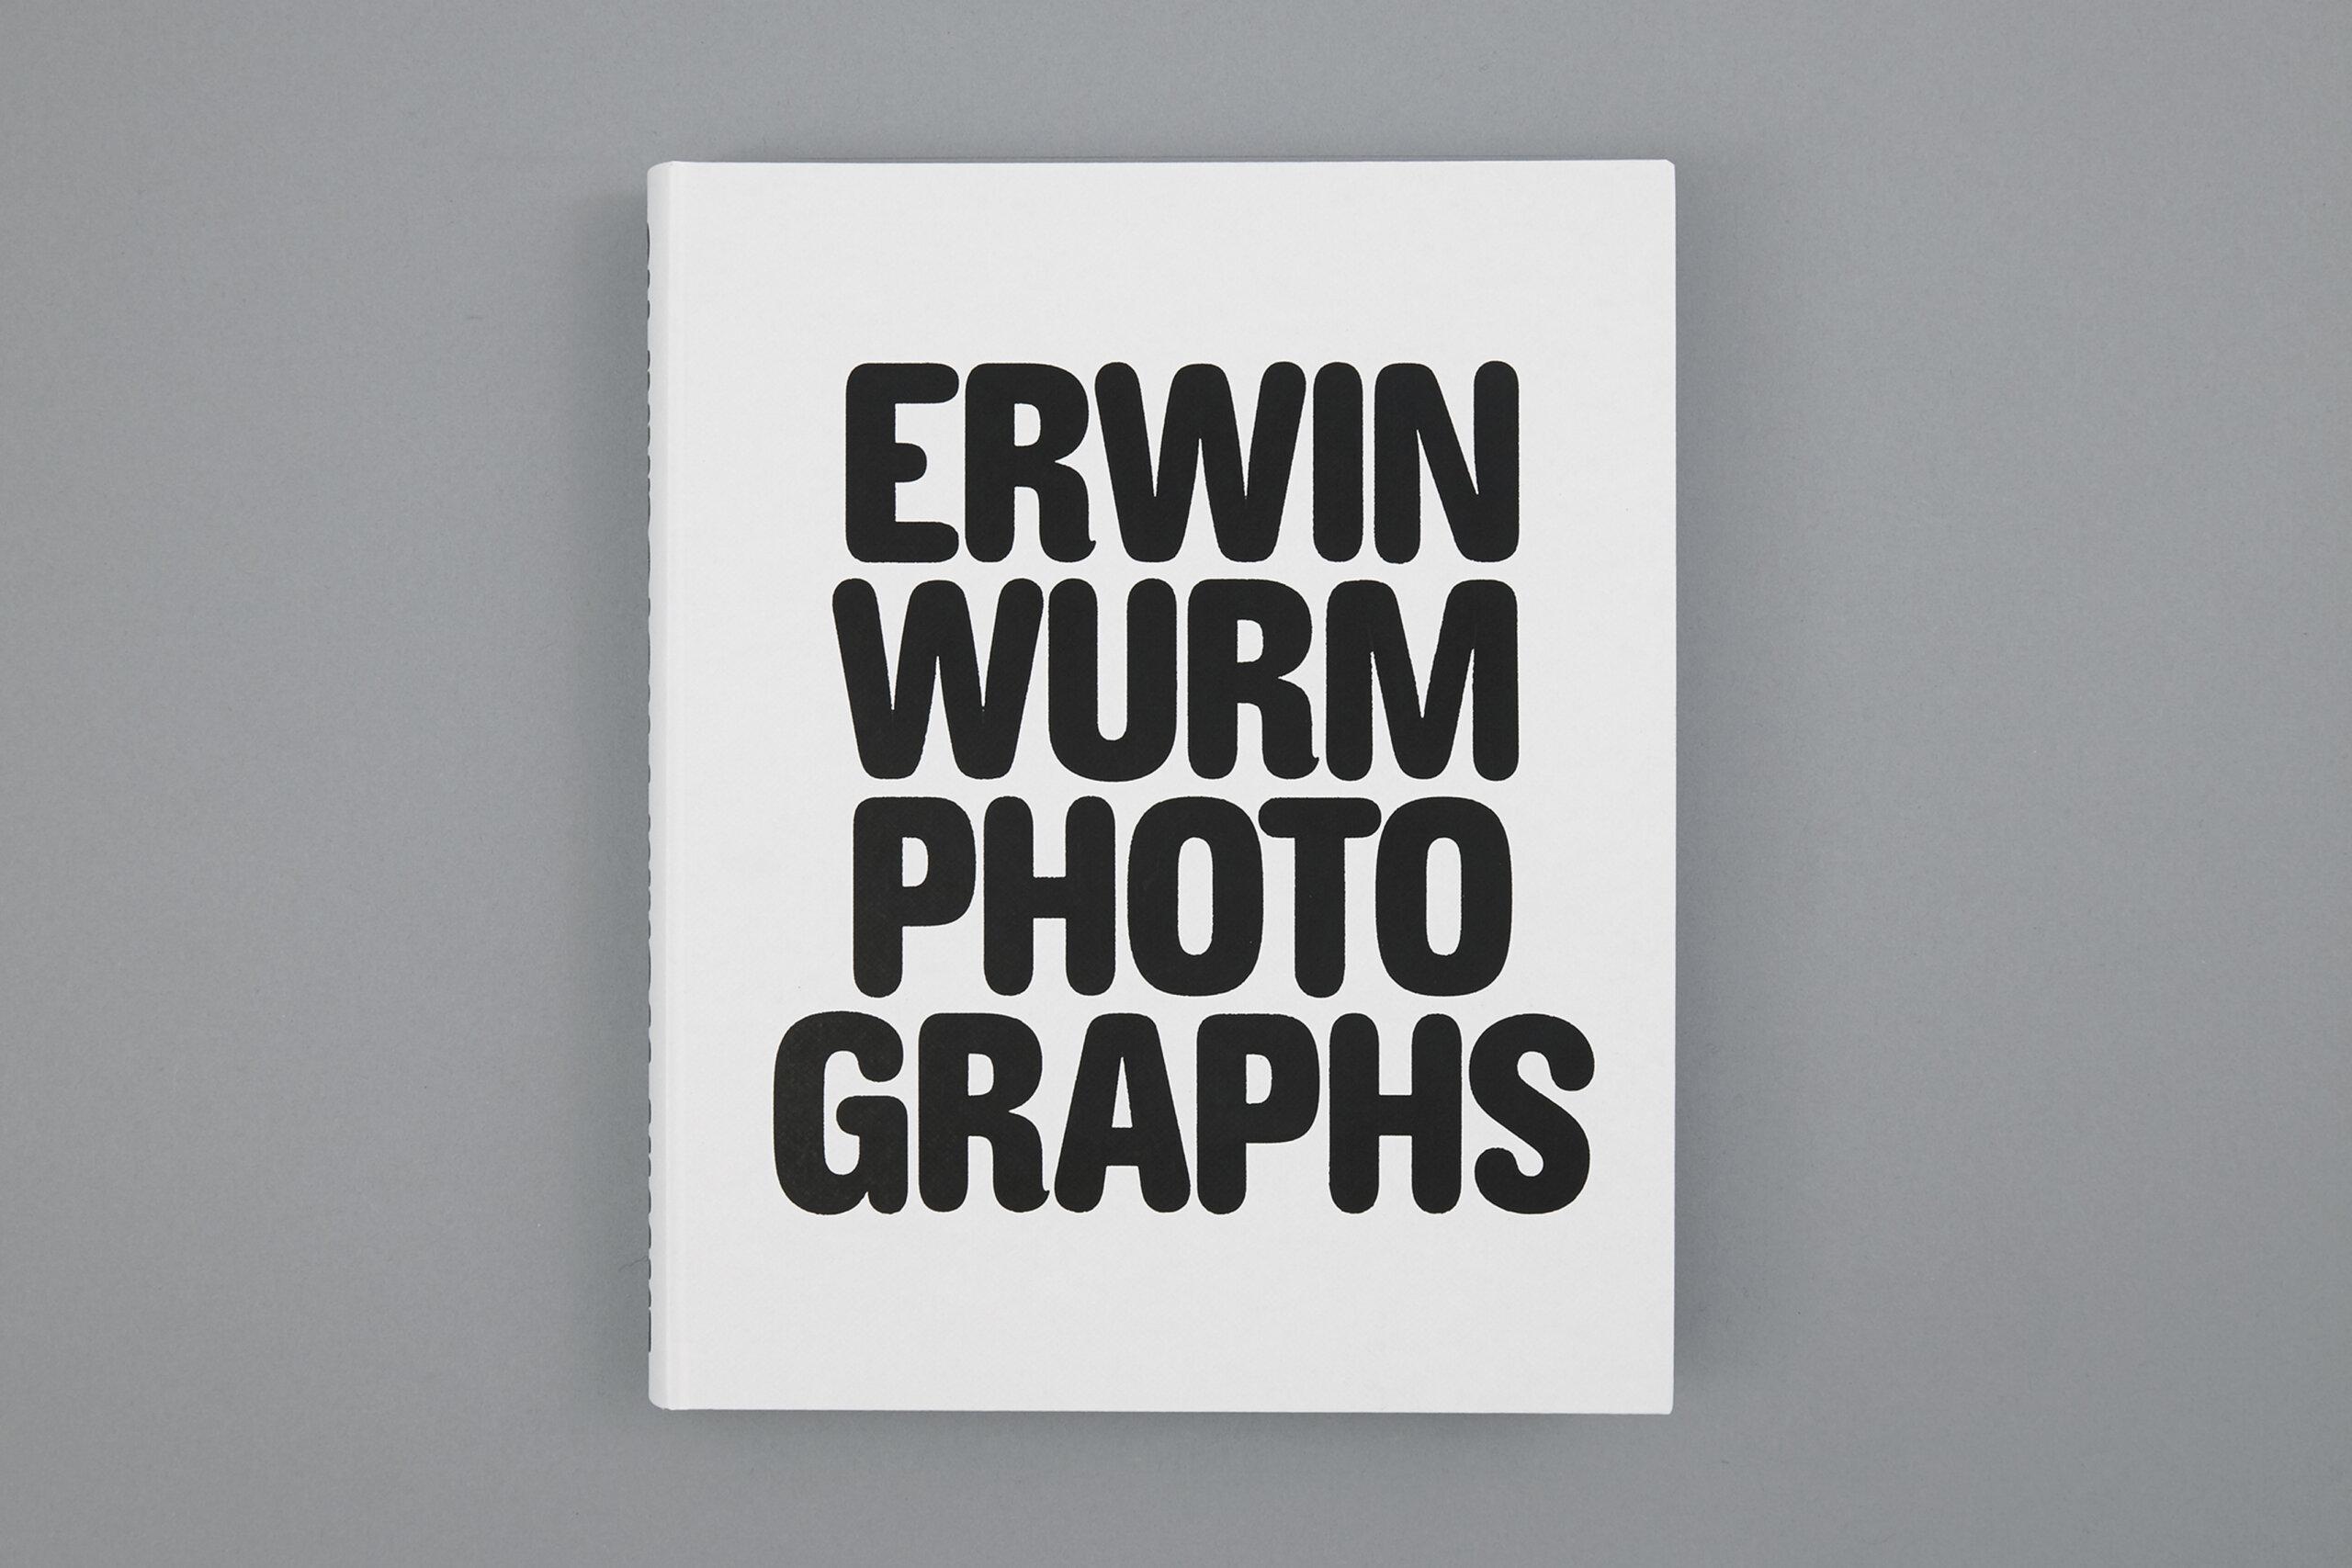 wurm-photographs-delpire-co-1